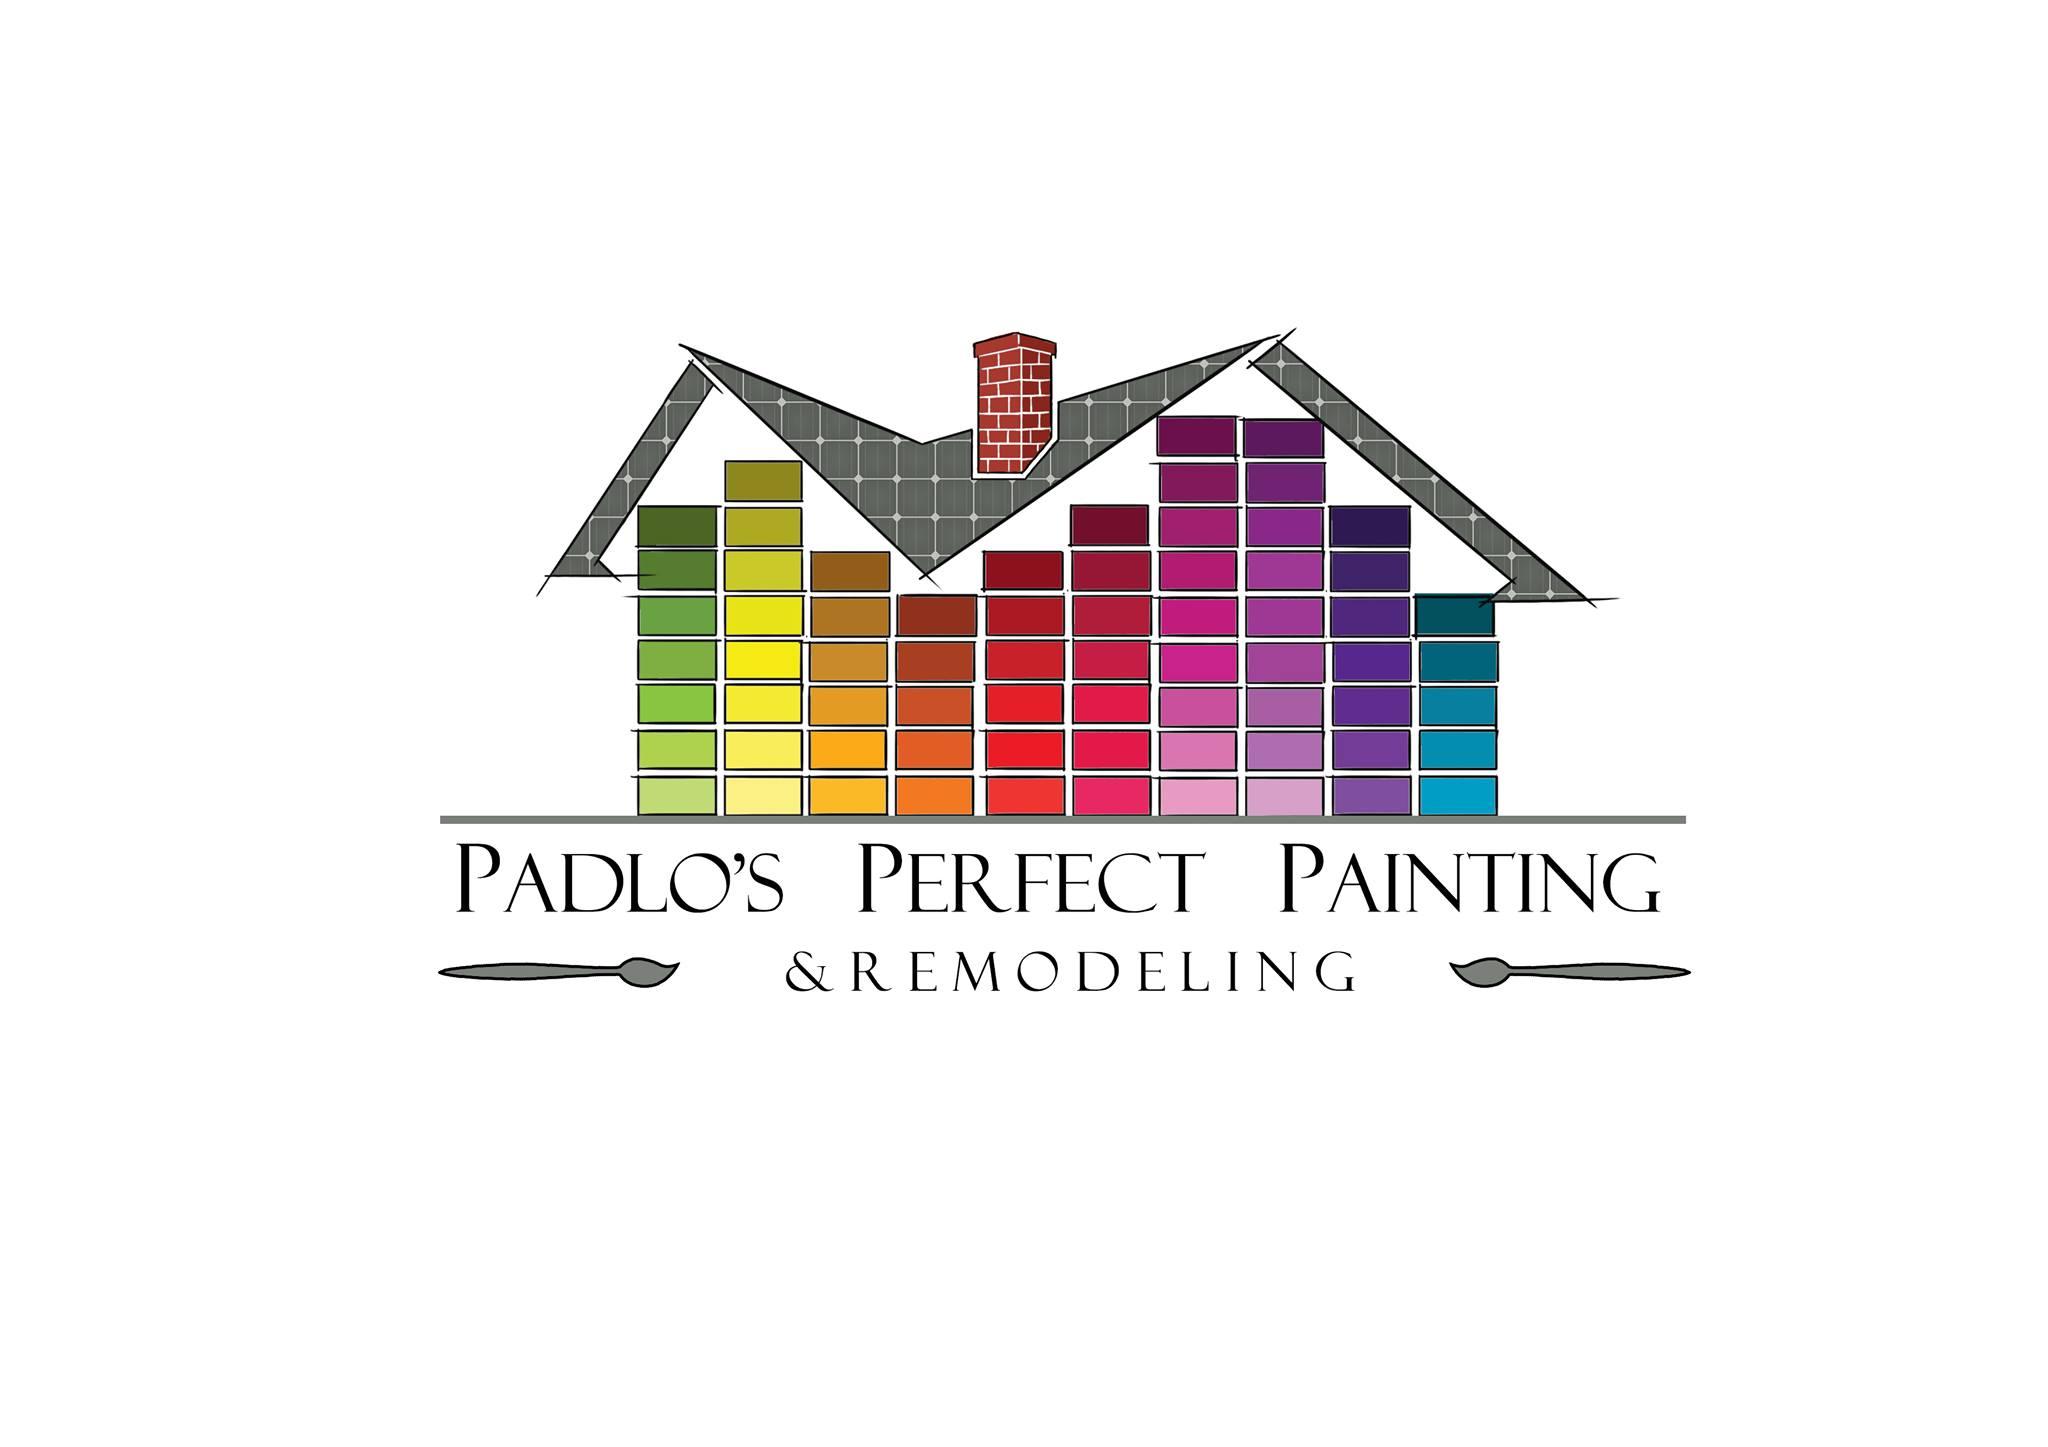 Padlo's Perfect Painting